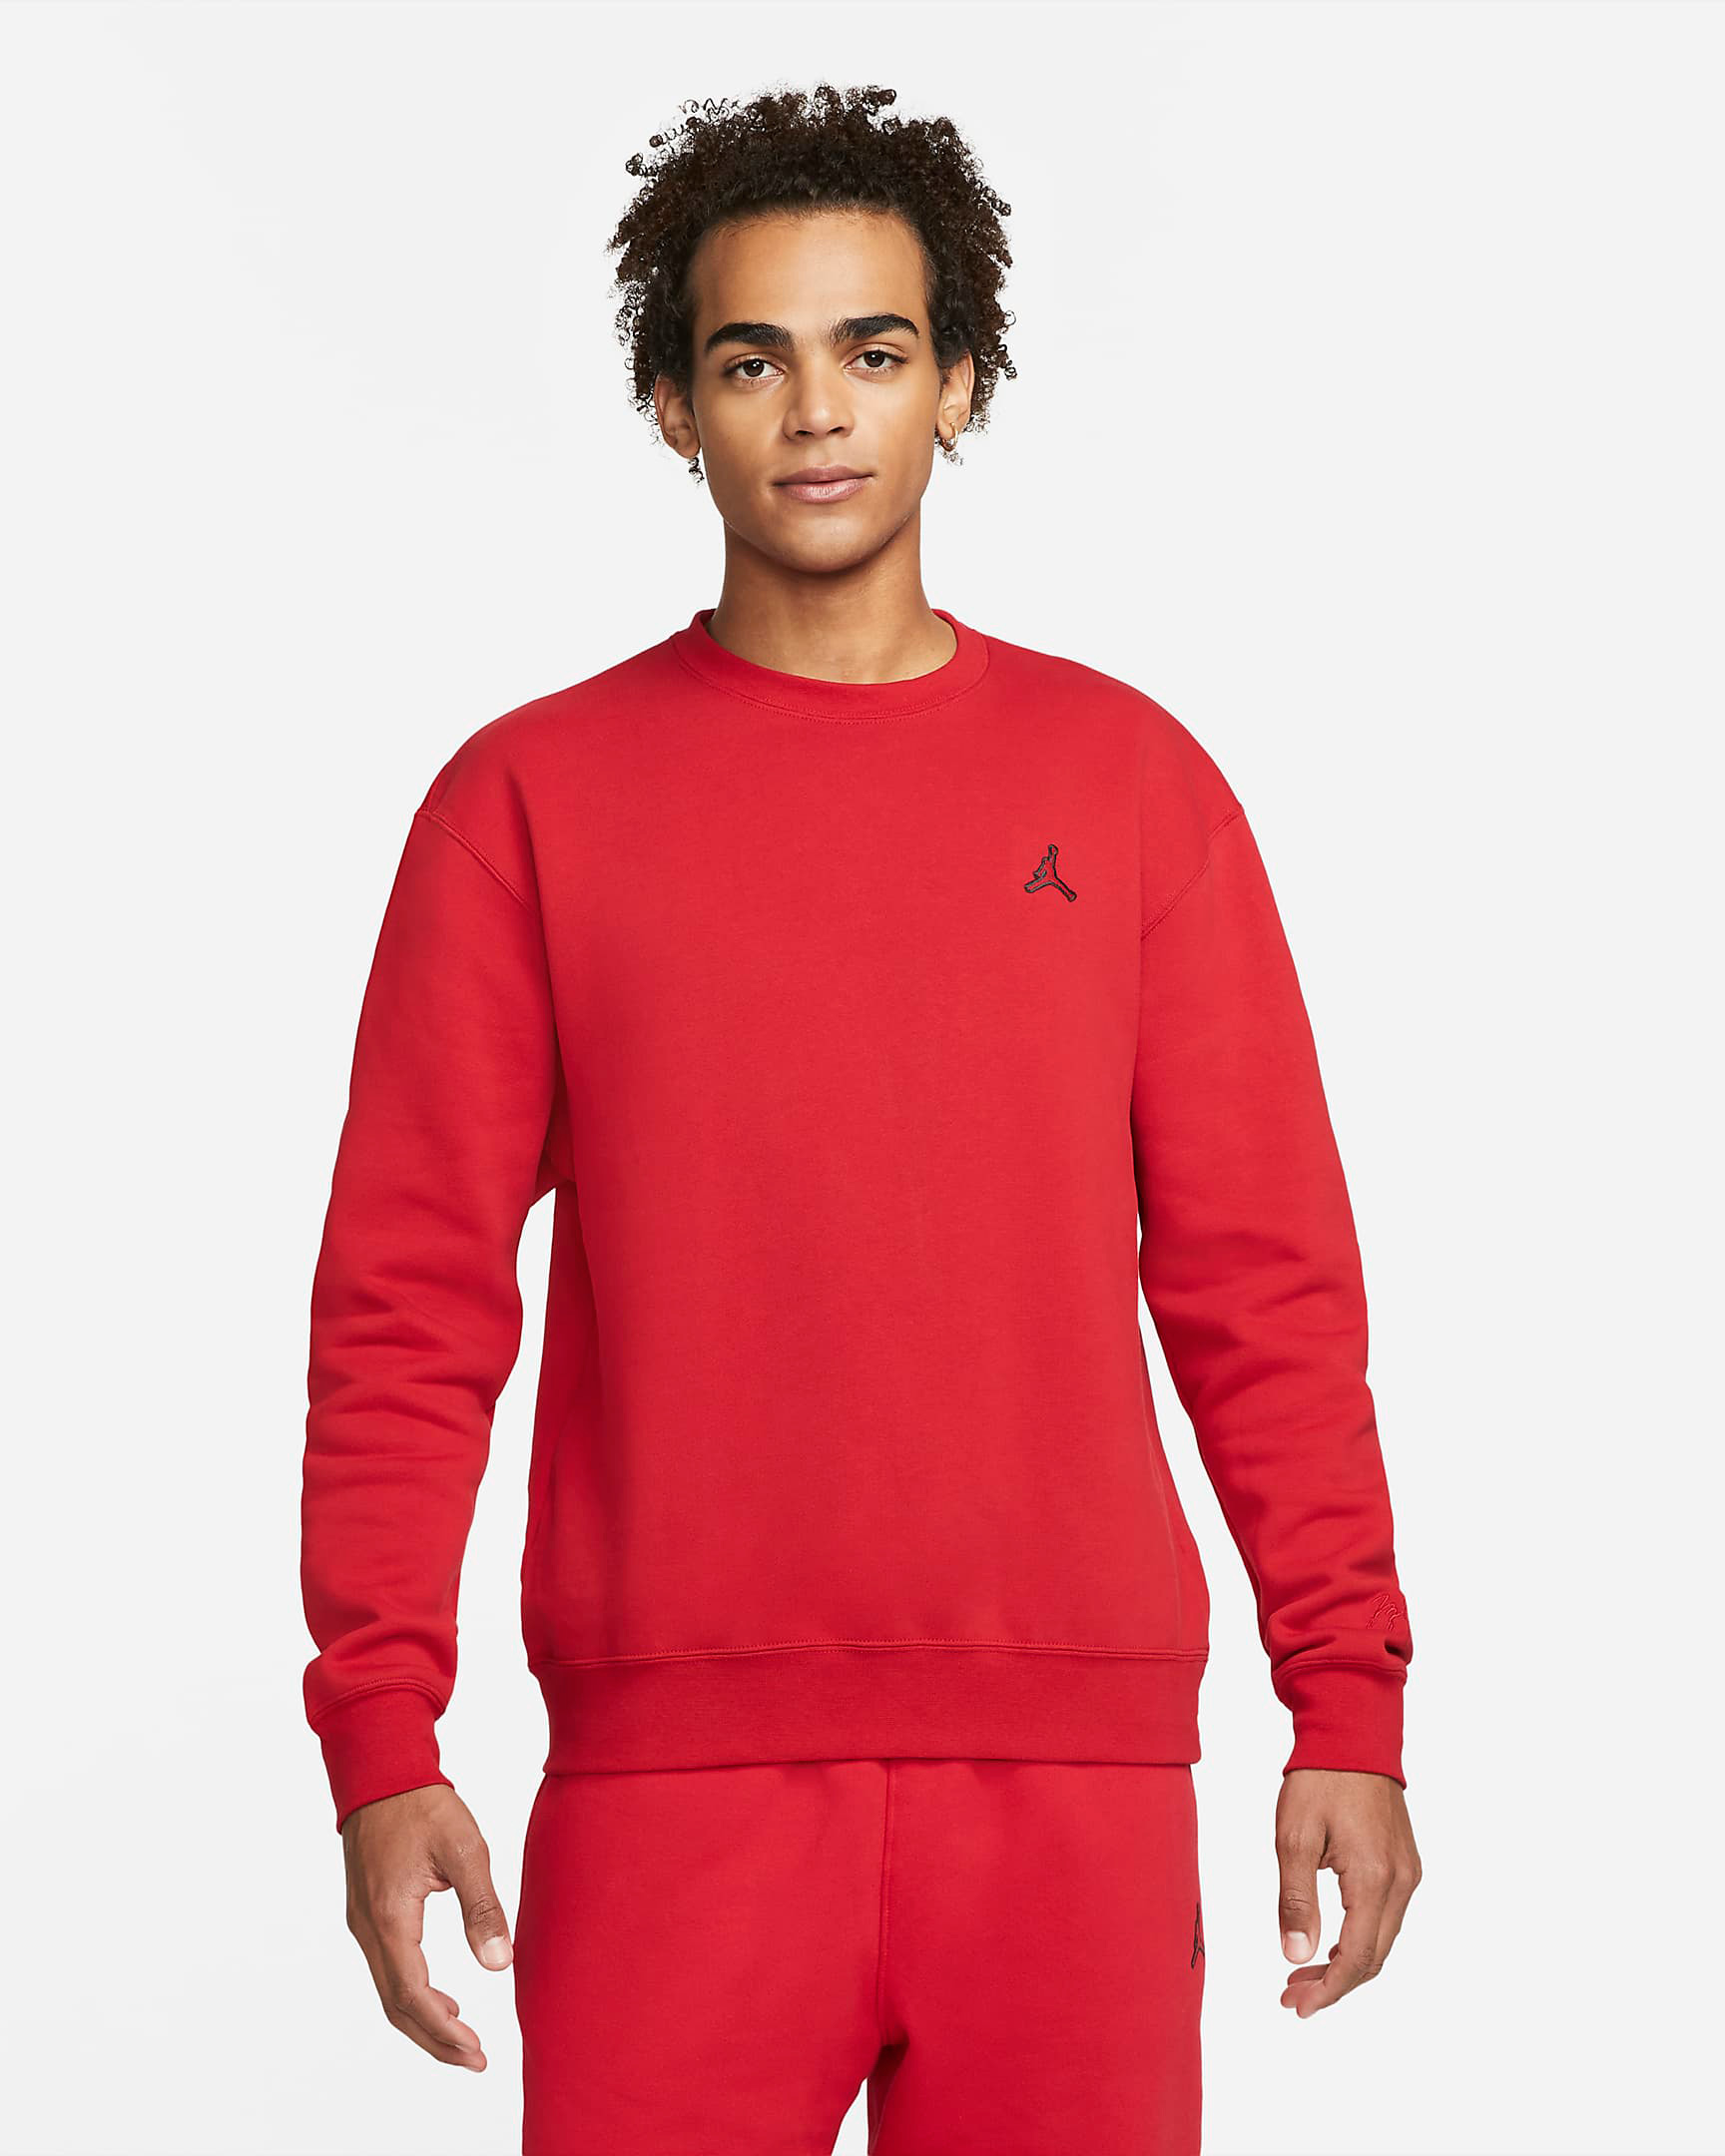 jordan-gym-red-essentials-sweatshirt-1